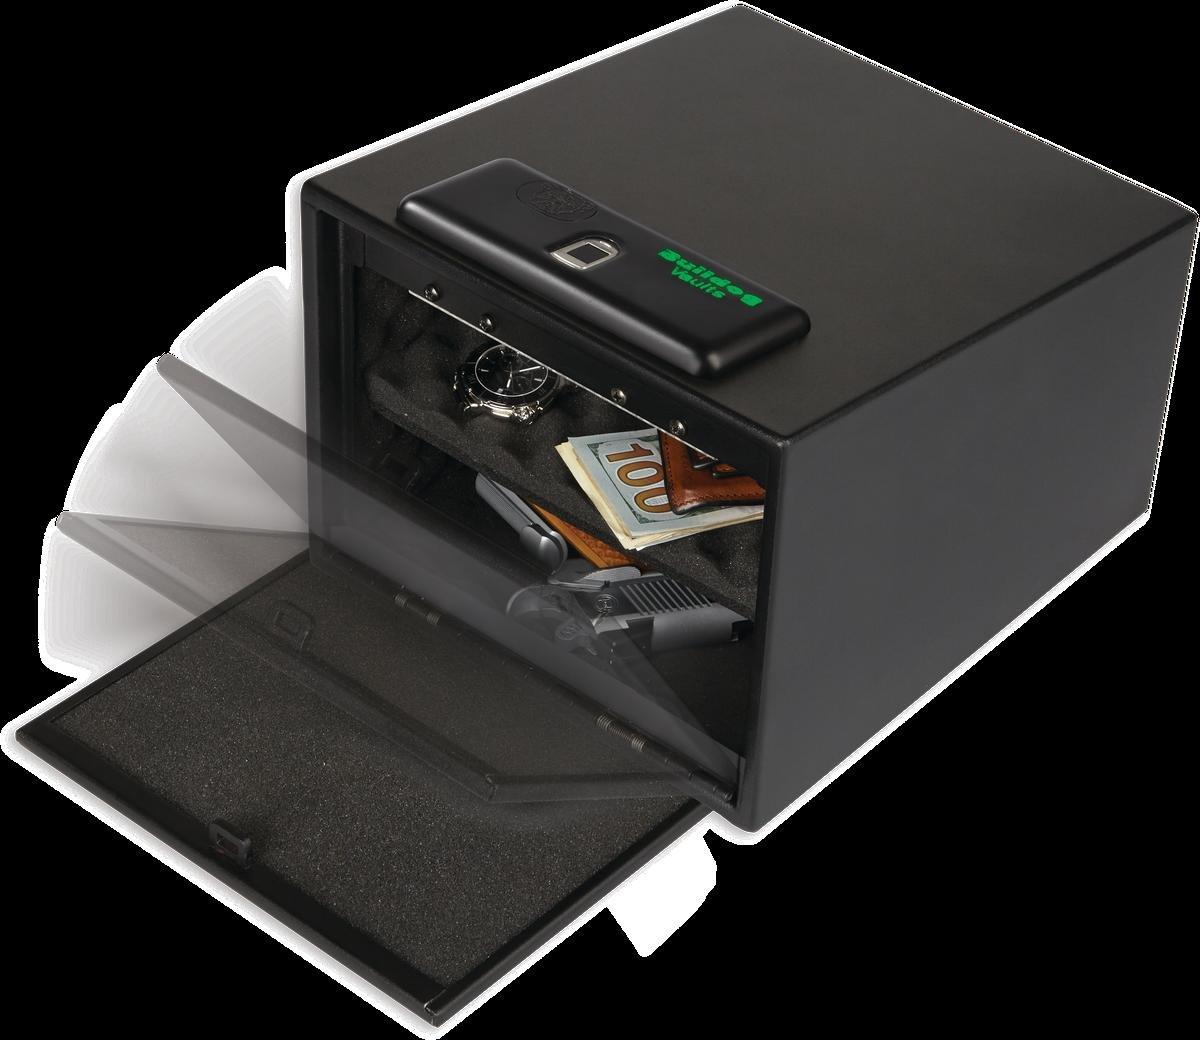 Bulldog Vaults Magnum Biometric Pistol Vault with Shelf Black, 11.5 x 10 x 8'' by Bulldog Vaults (Image #2)